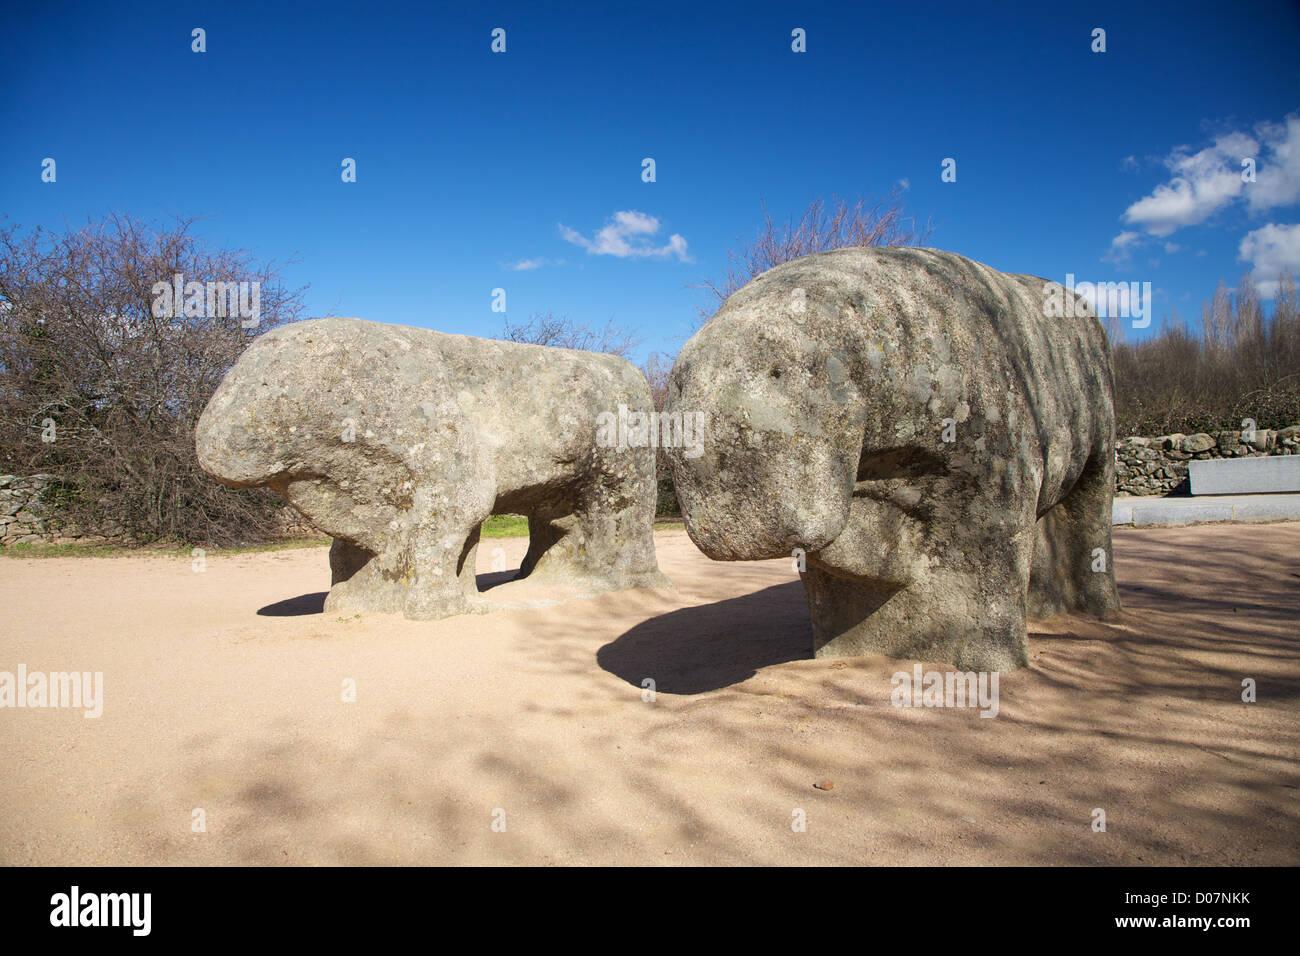 celtiberian second century BC Guisando stone bulls at Avila Spain - Stock Image